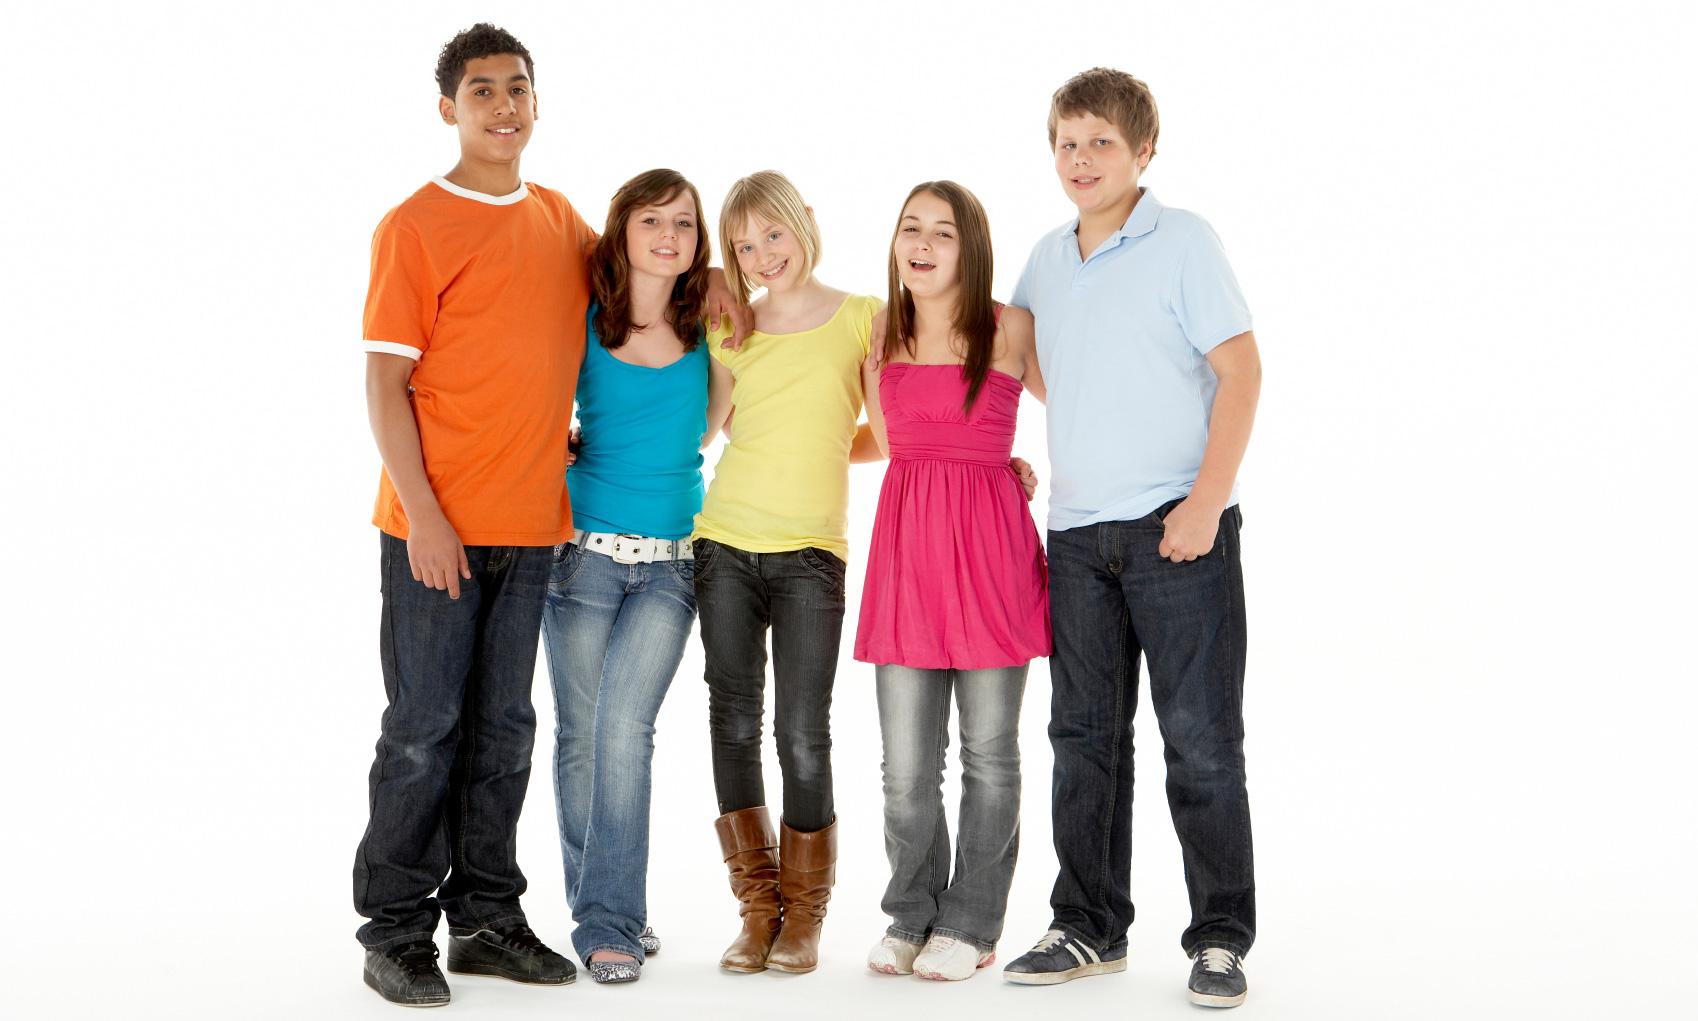 parent essay for high school admission